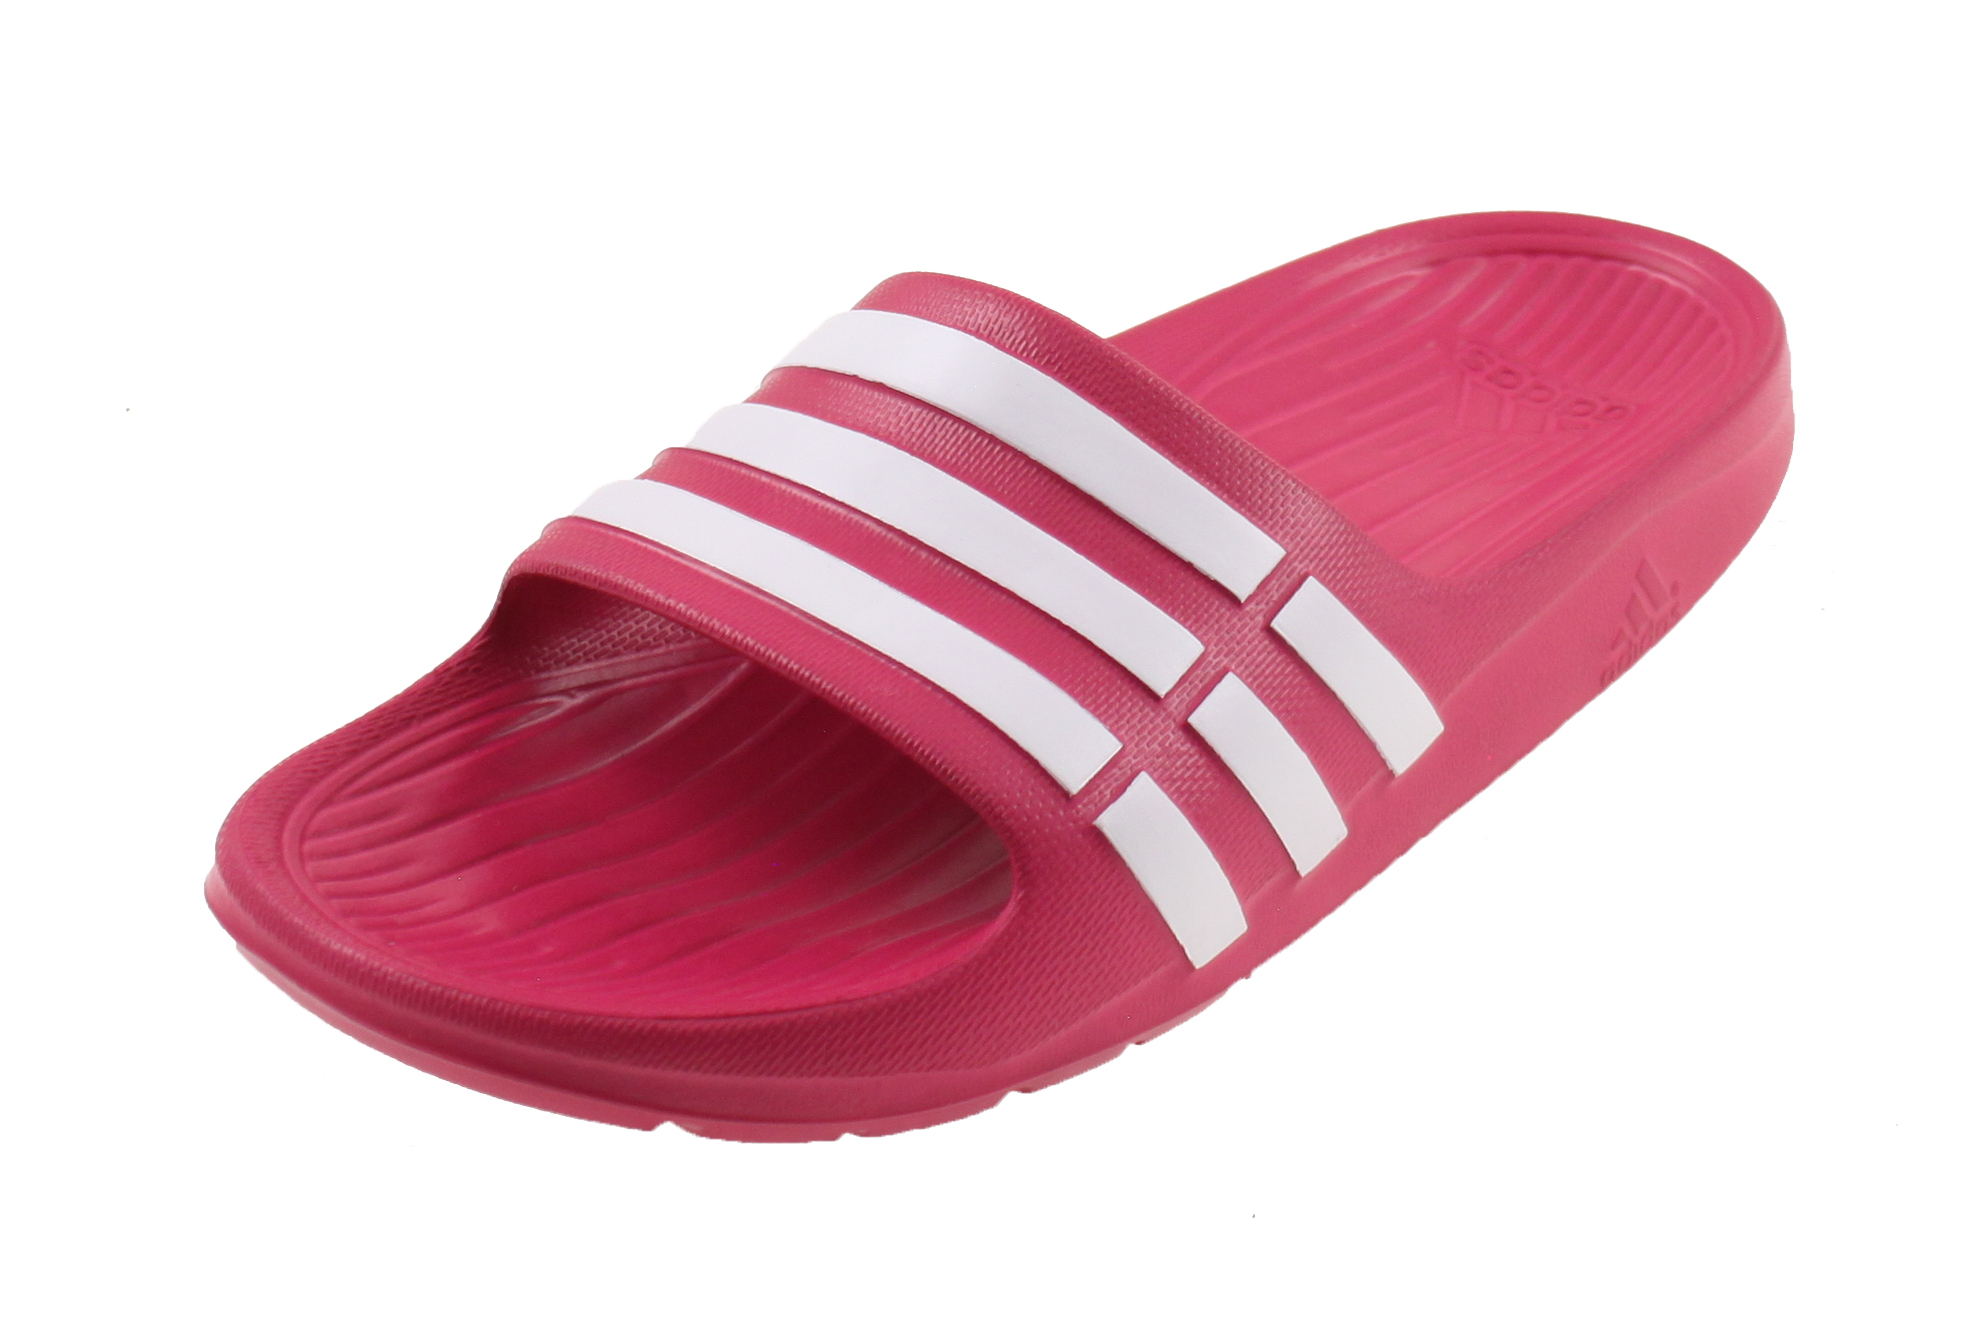 Adidas Duramo Badslipper